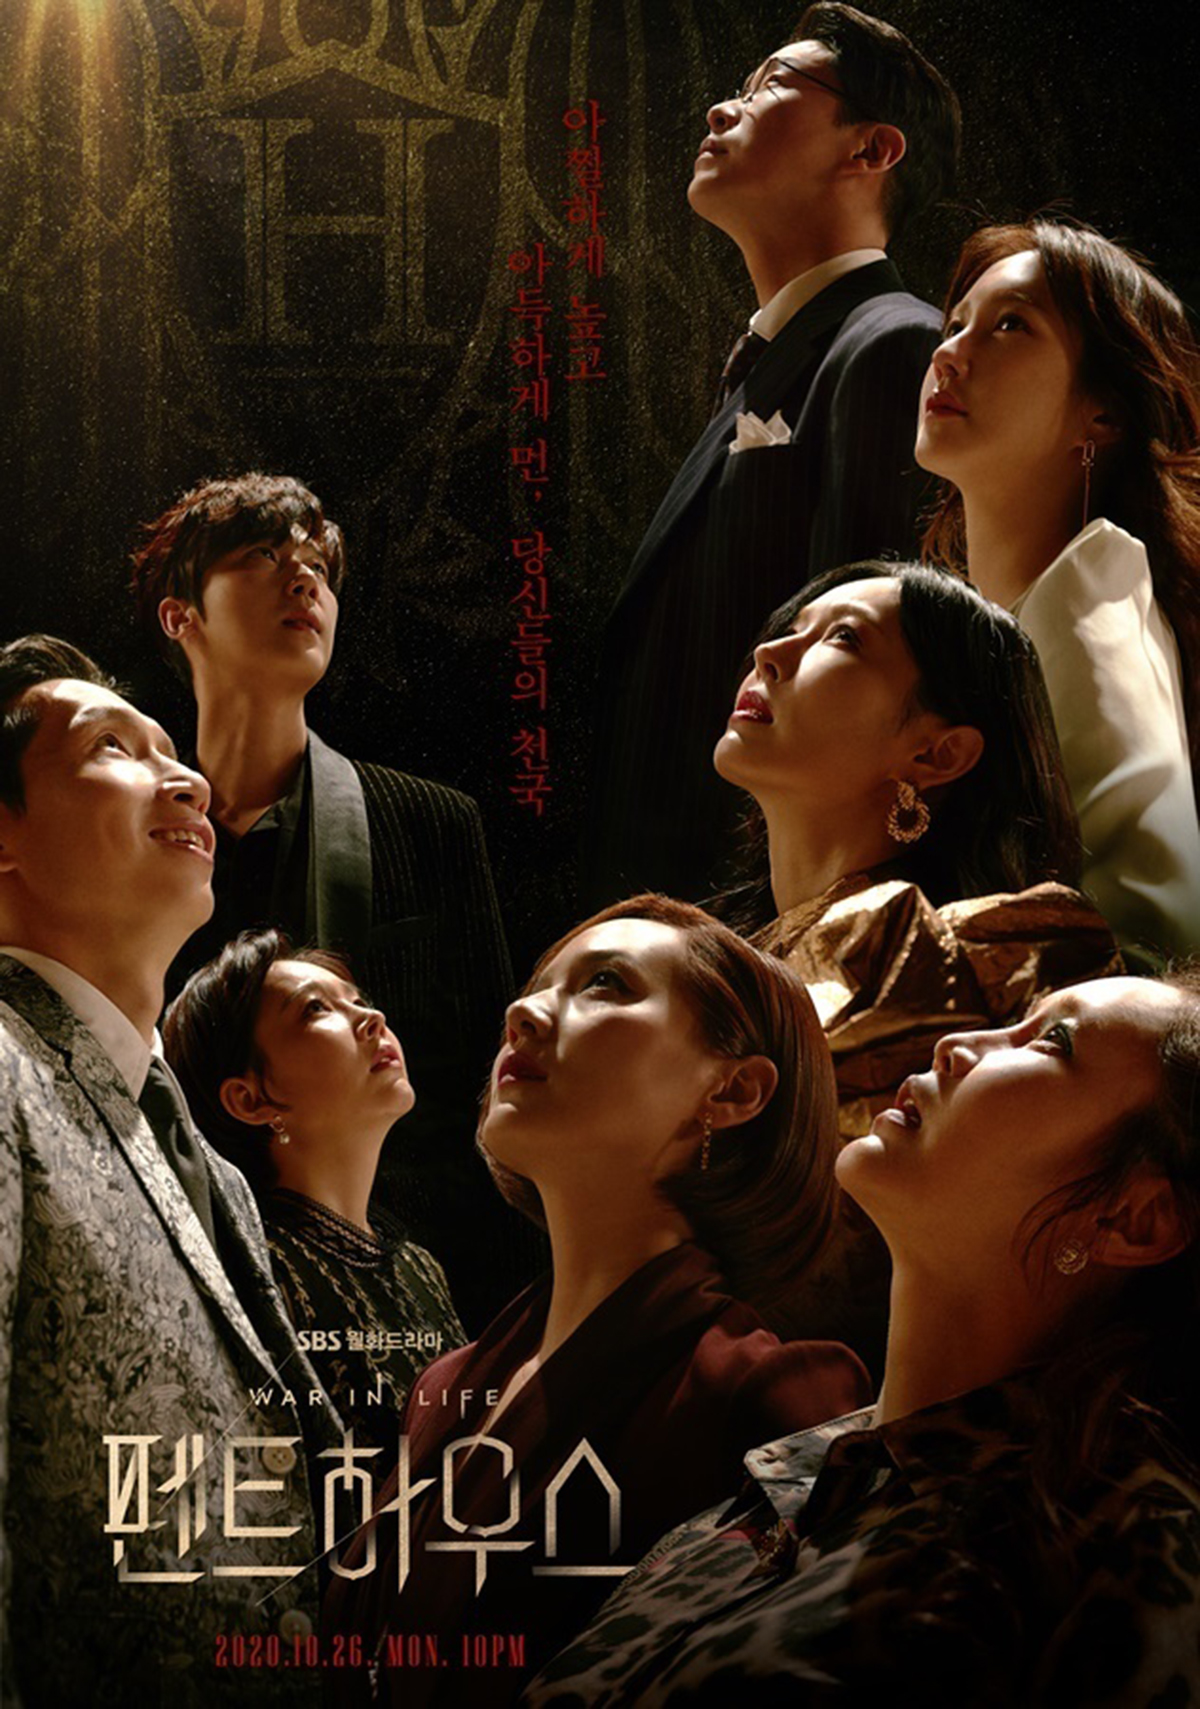 Korean Drama The Penthouse : War In Life